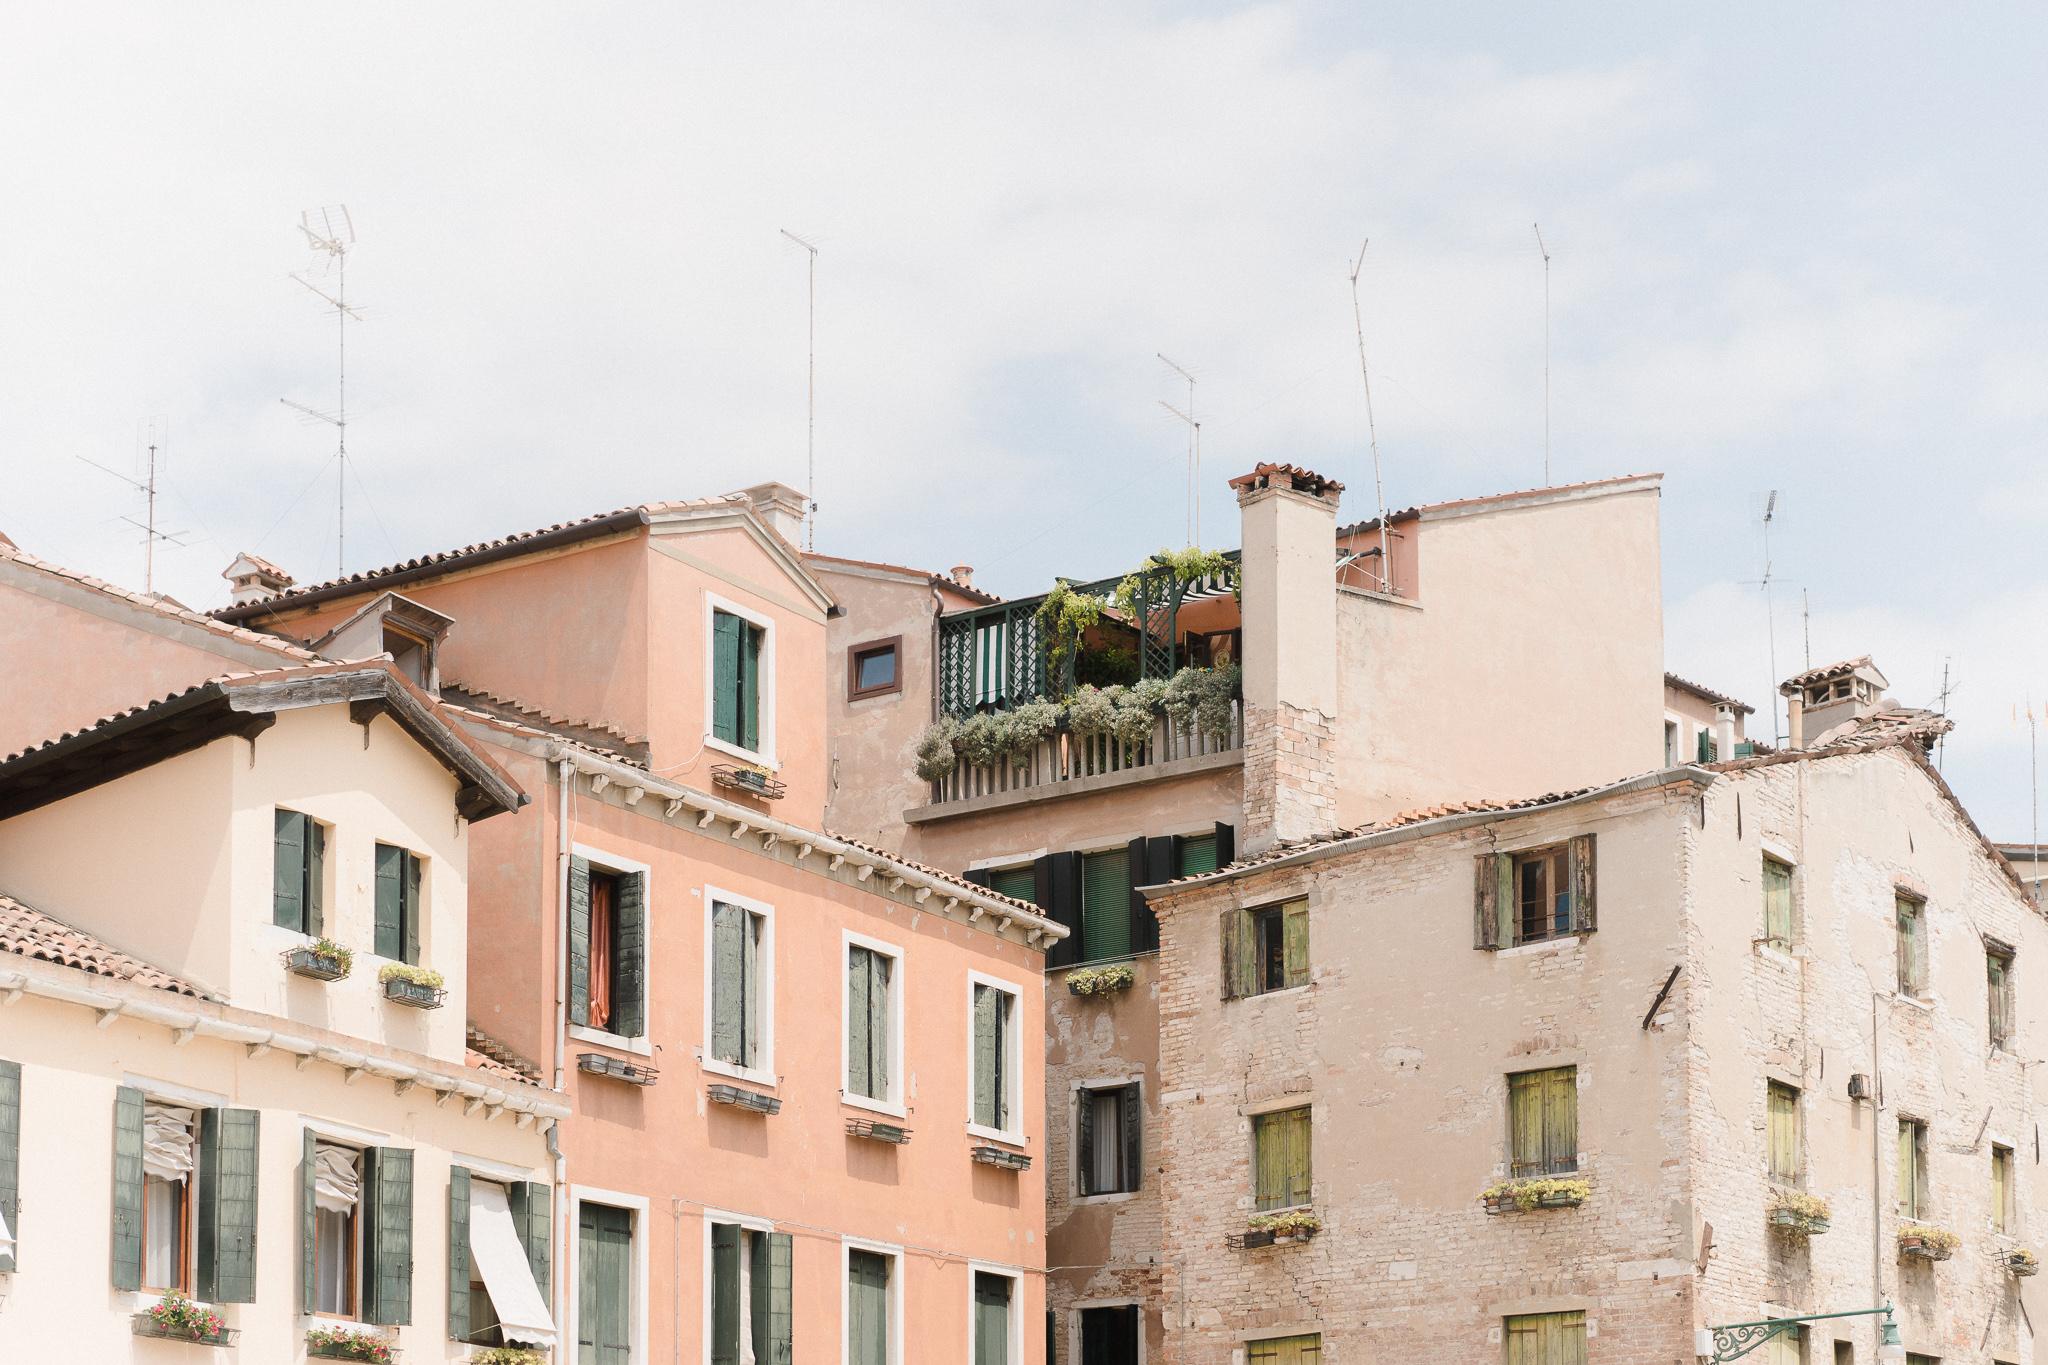 Venice, Italy - June 2016